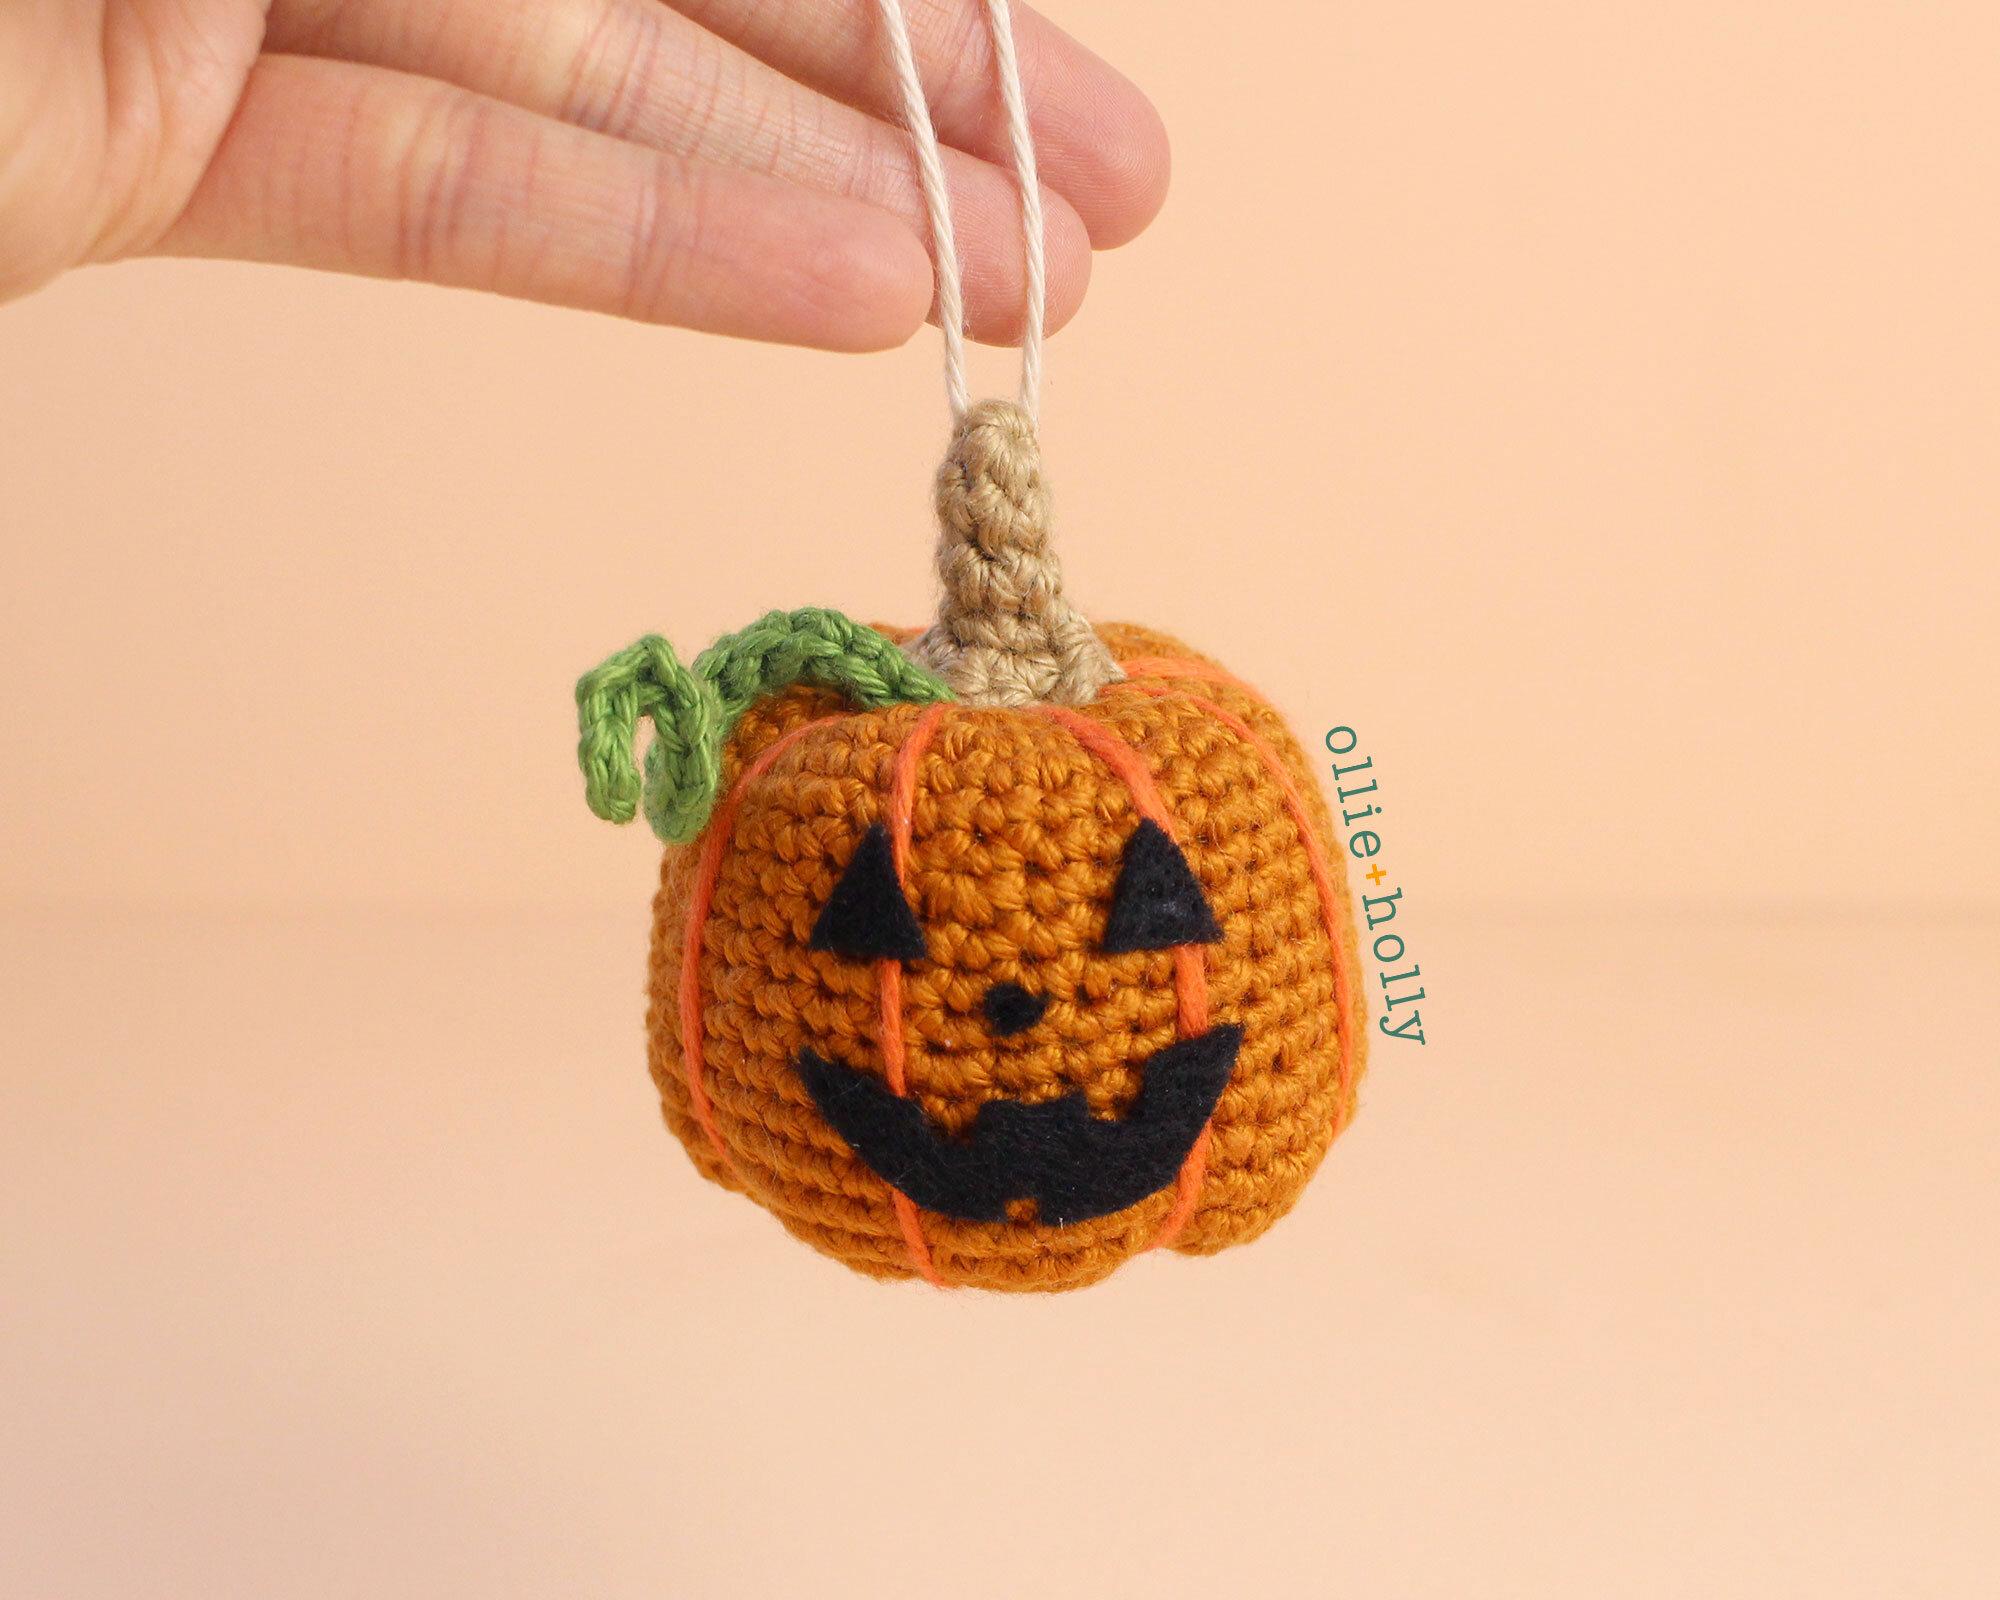 Free Jack-o'-Lantern Pumpkin Ornament Amigurumi Crochet Pattern Complete